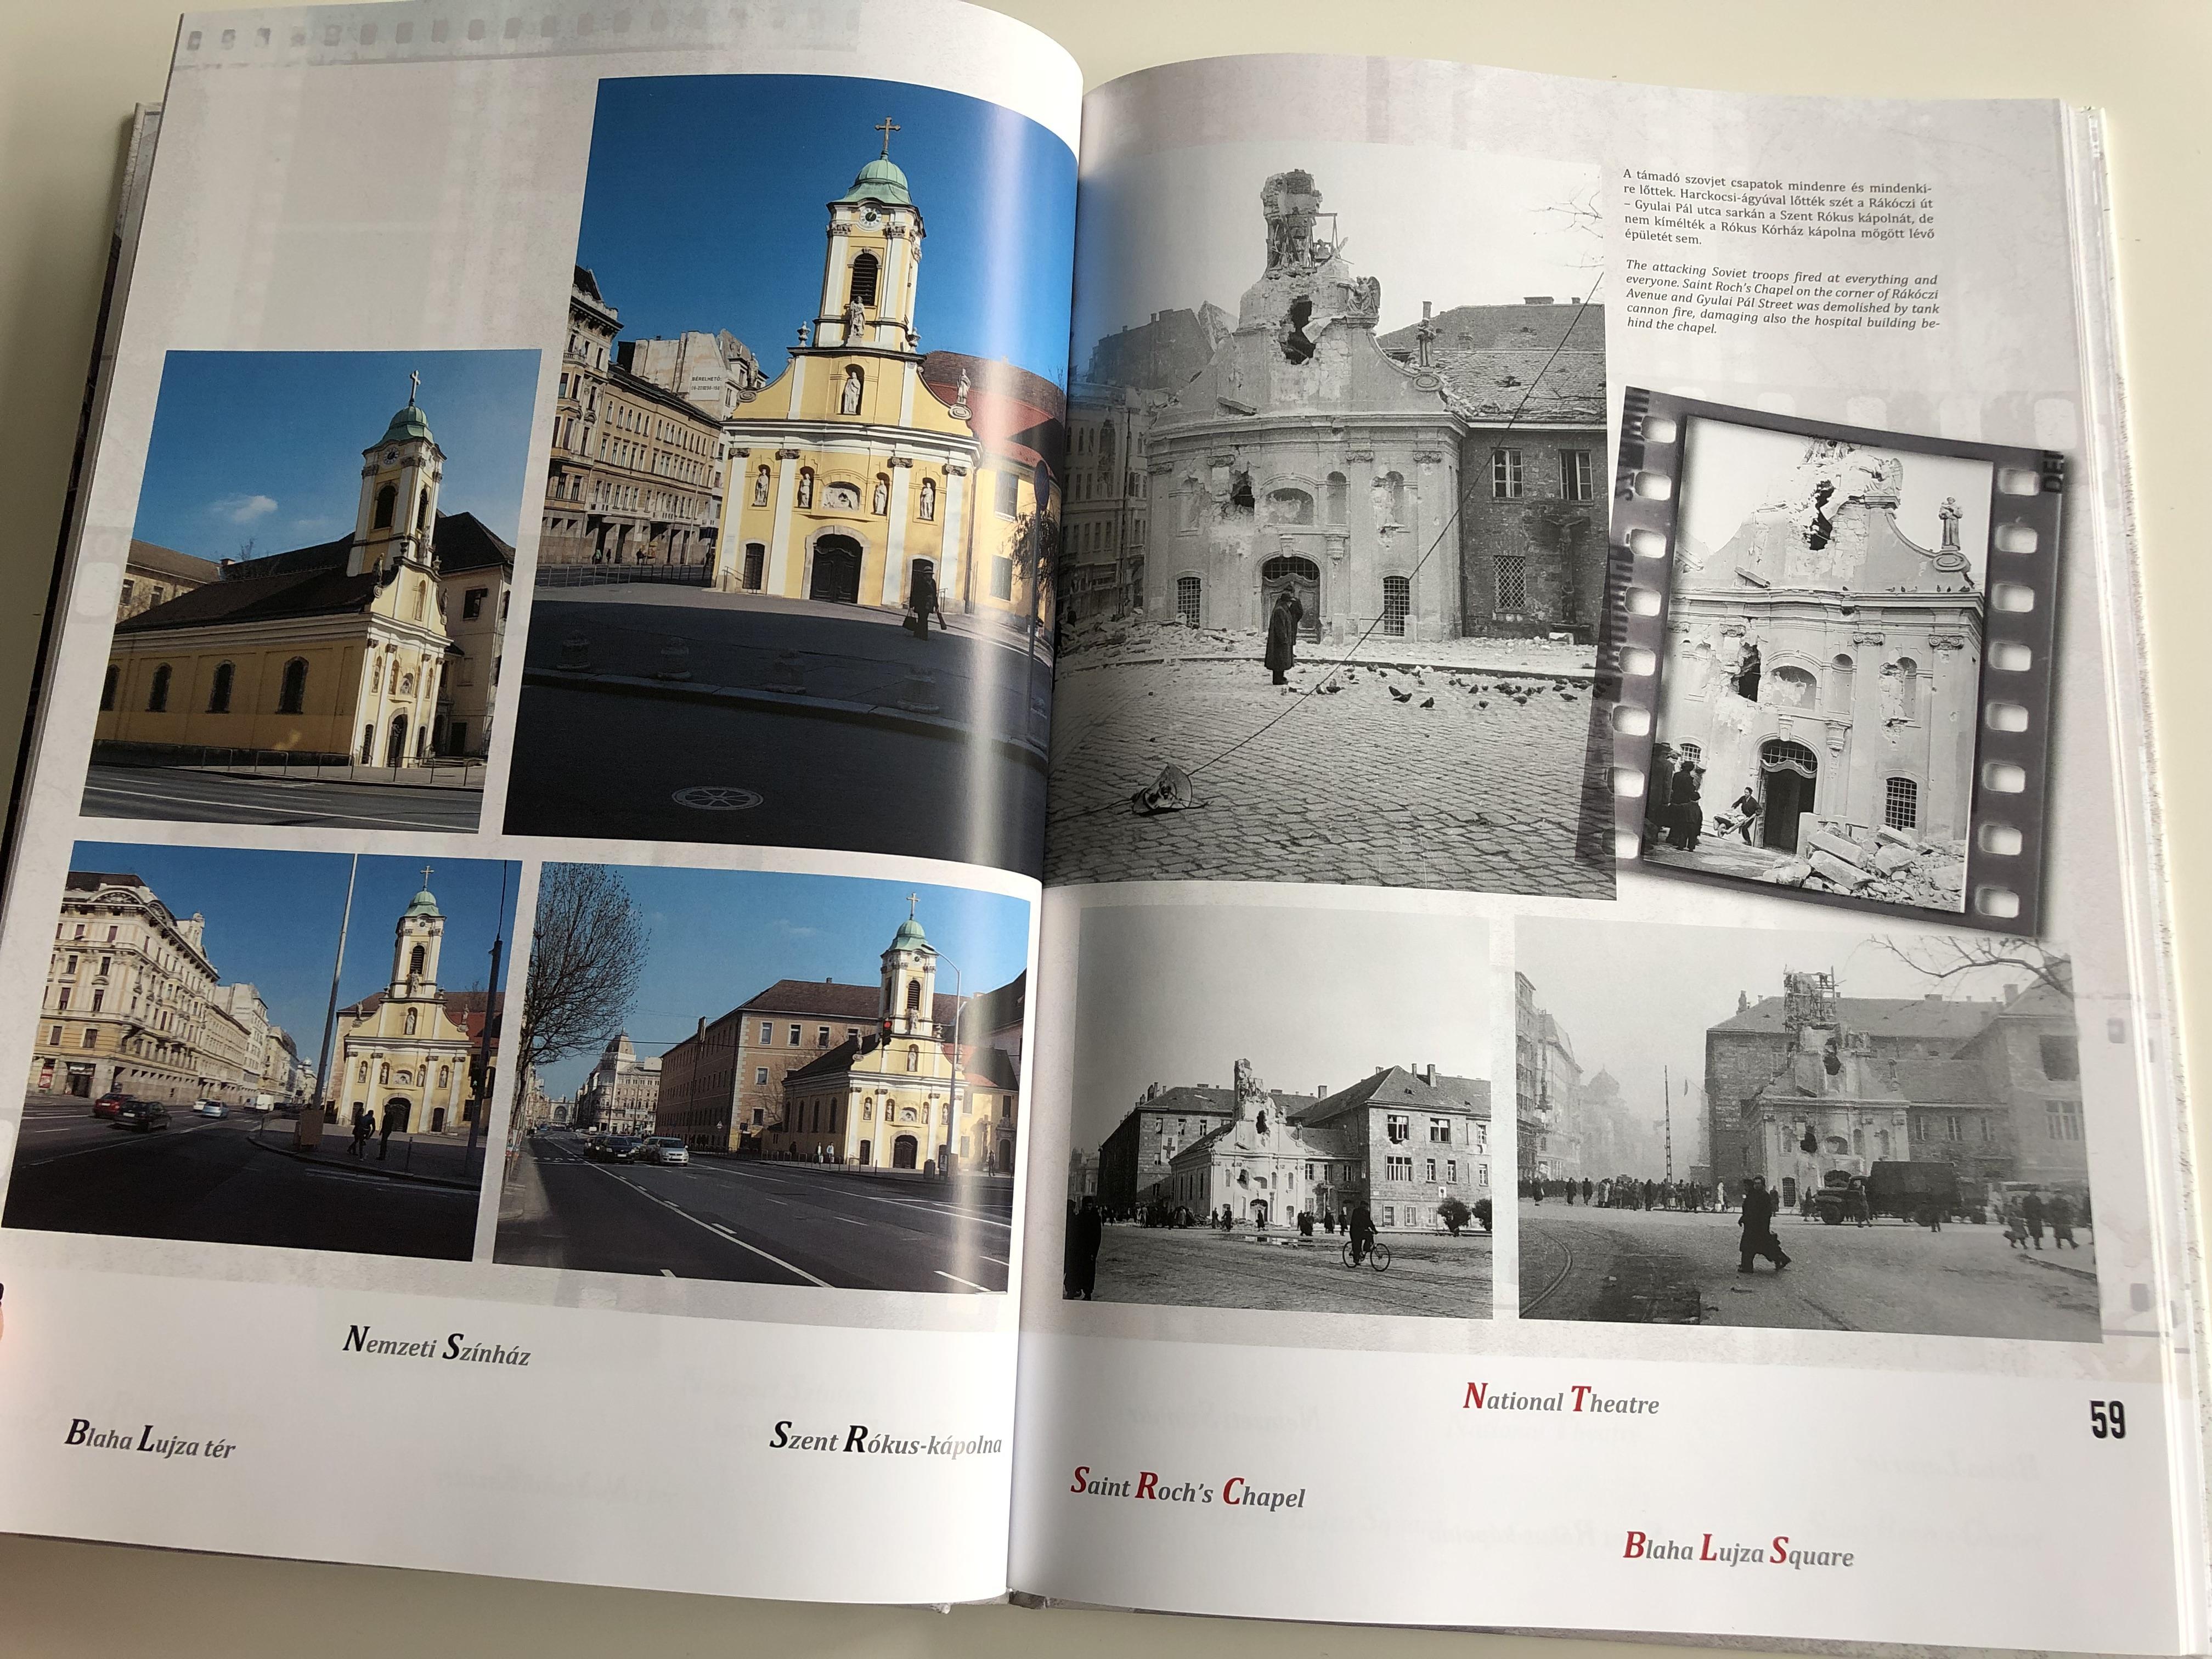 budapest-1956-id-utaz-s-a-journey-to-the-past-by-horv-th-mikl-s-szikits-p-ter-hadt-rt-neti-int-zet-s-m-zeum-hardcover-2016-10-.jpg